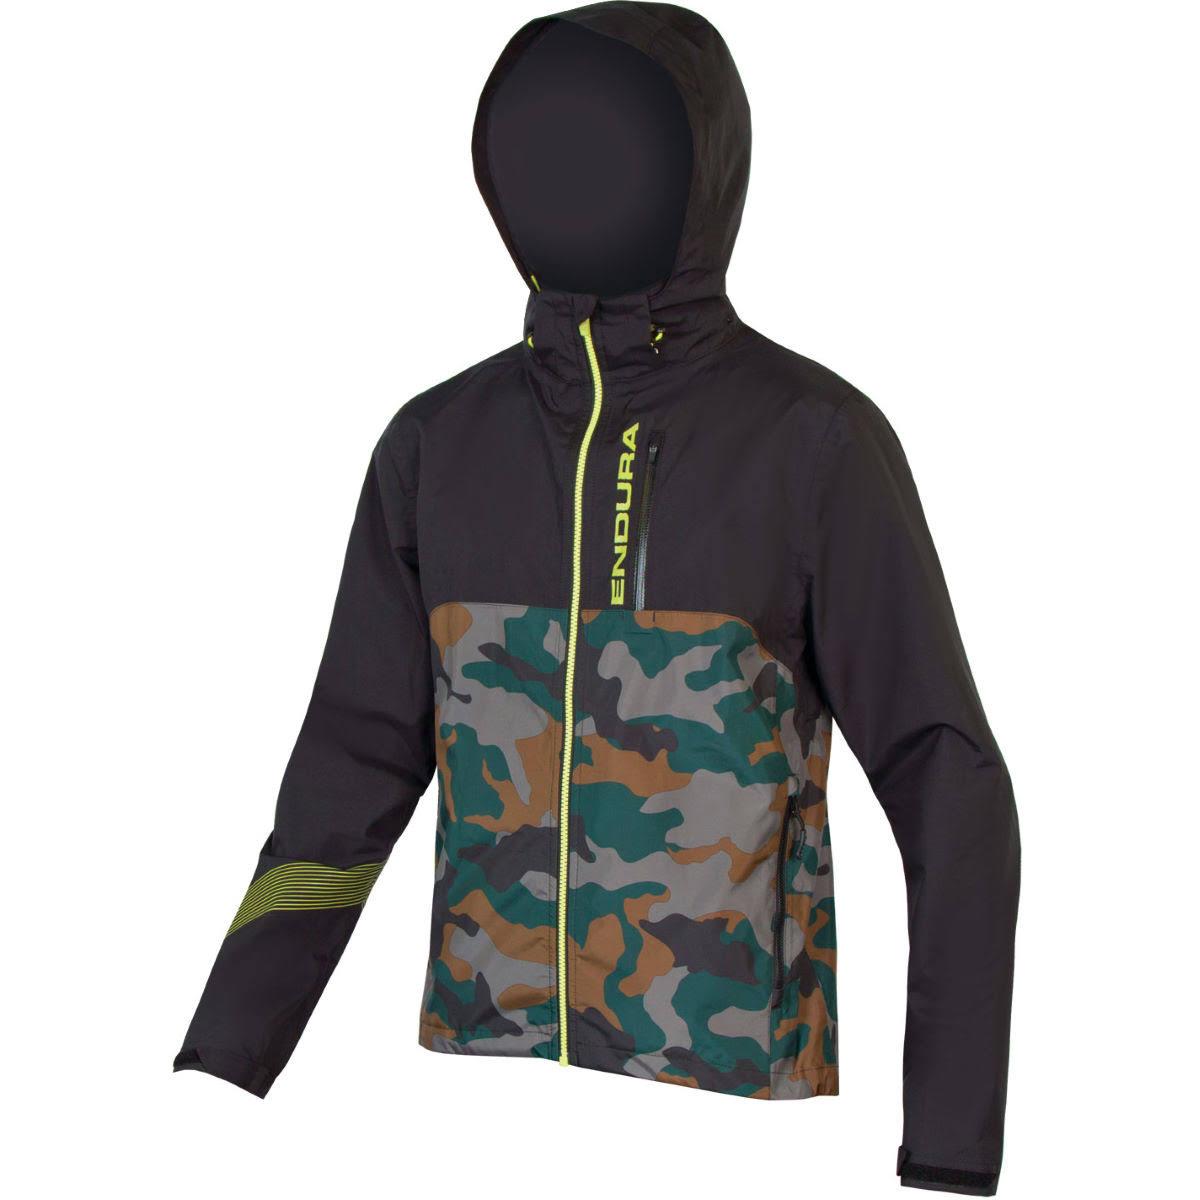 Jacket Singletrack Ii Endura Ii Camuflaje Endura Camuflaje Singletrack Endura Singletrack Jacket qF6EU7